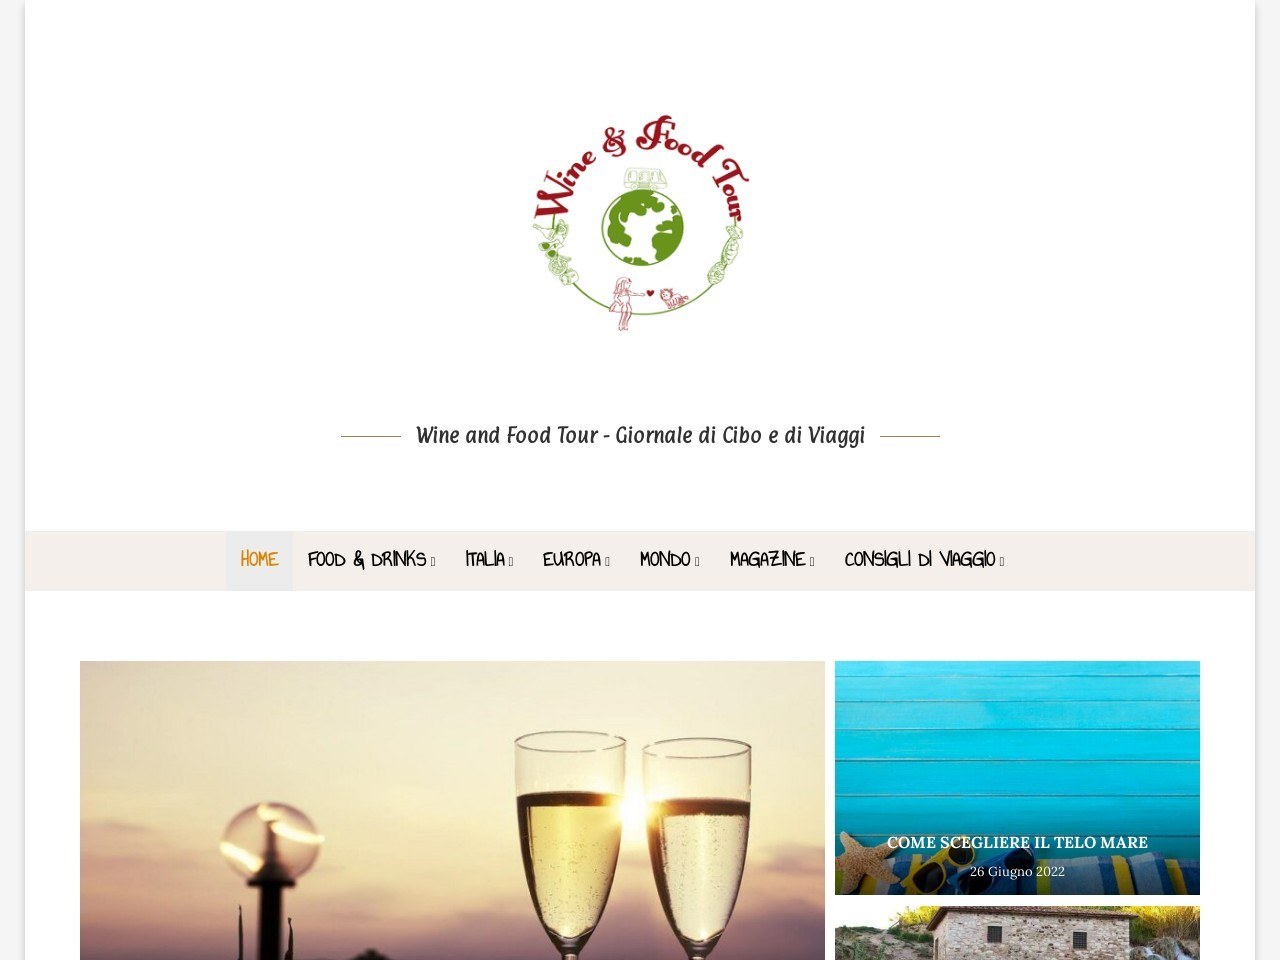 wine-and-food-tour-italia